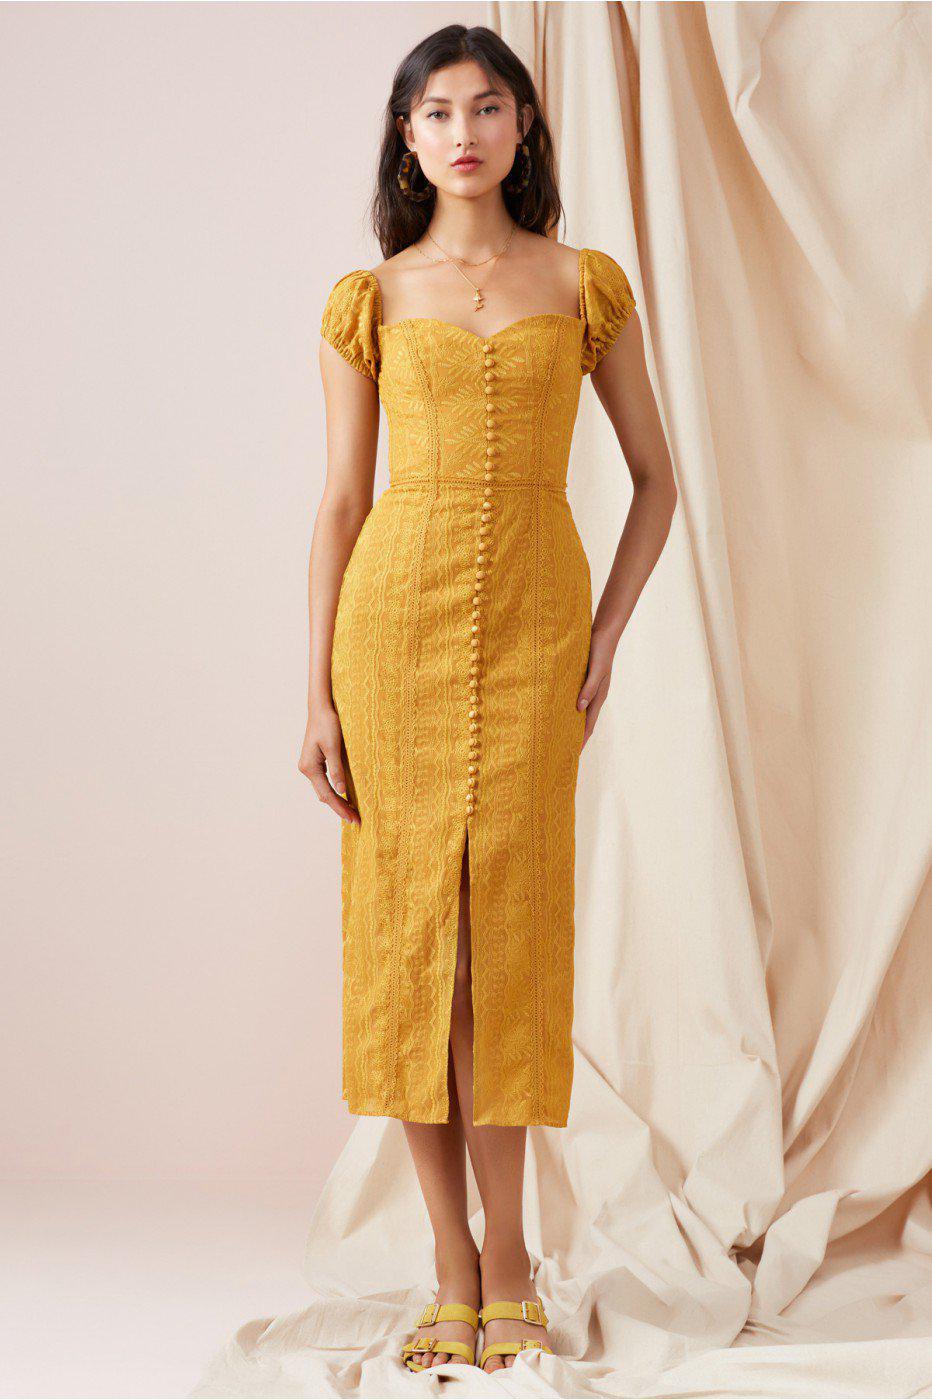 d68e30bb24 Finders Keepers Maella Midi Dress in Yellow - Lyst